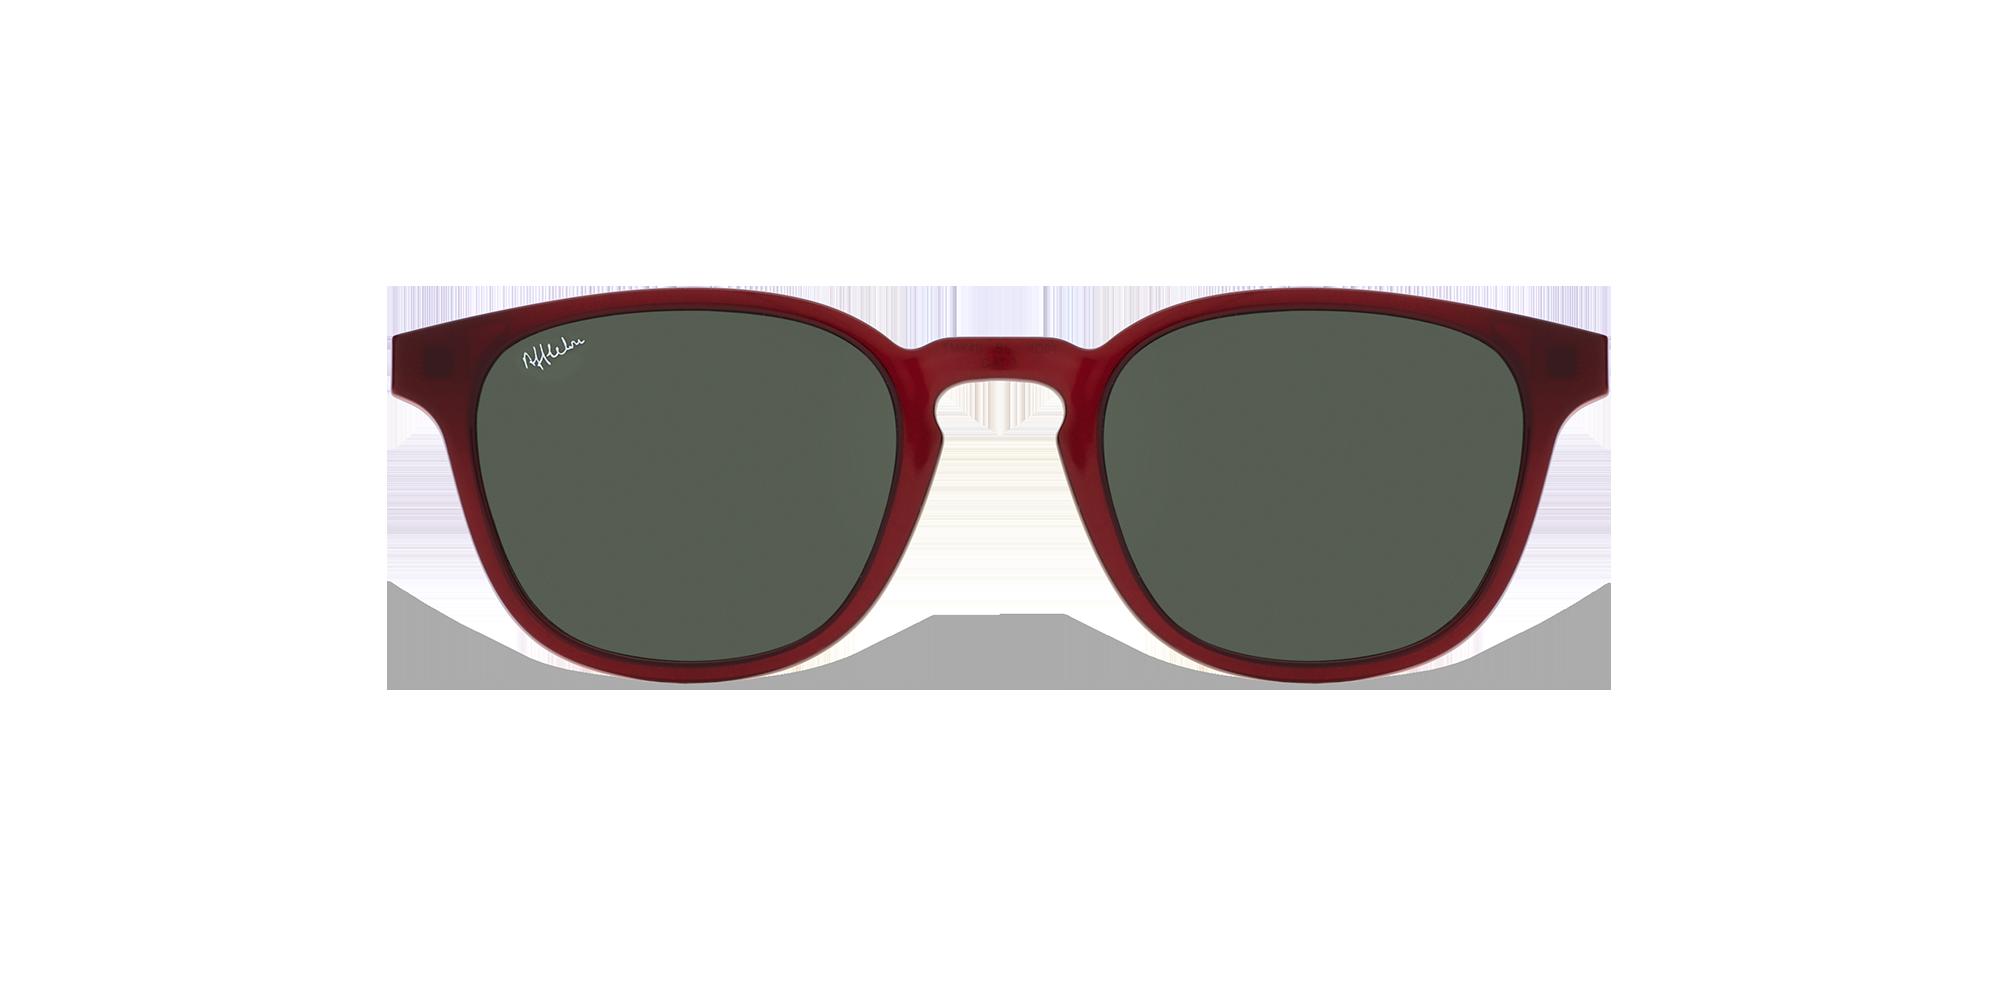 afflelou/france/products/smart_clip/clips_glasses/07630036429143_face.png